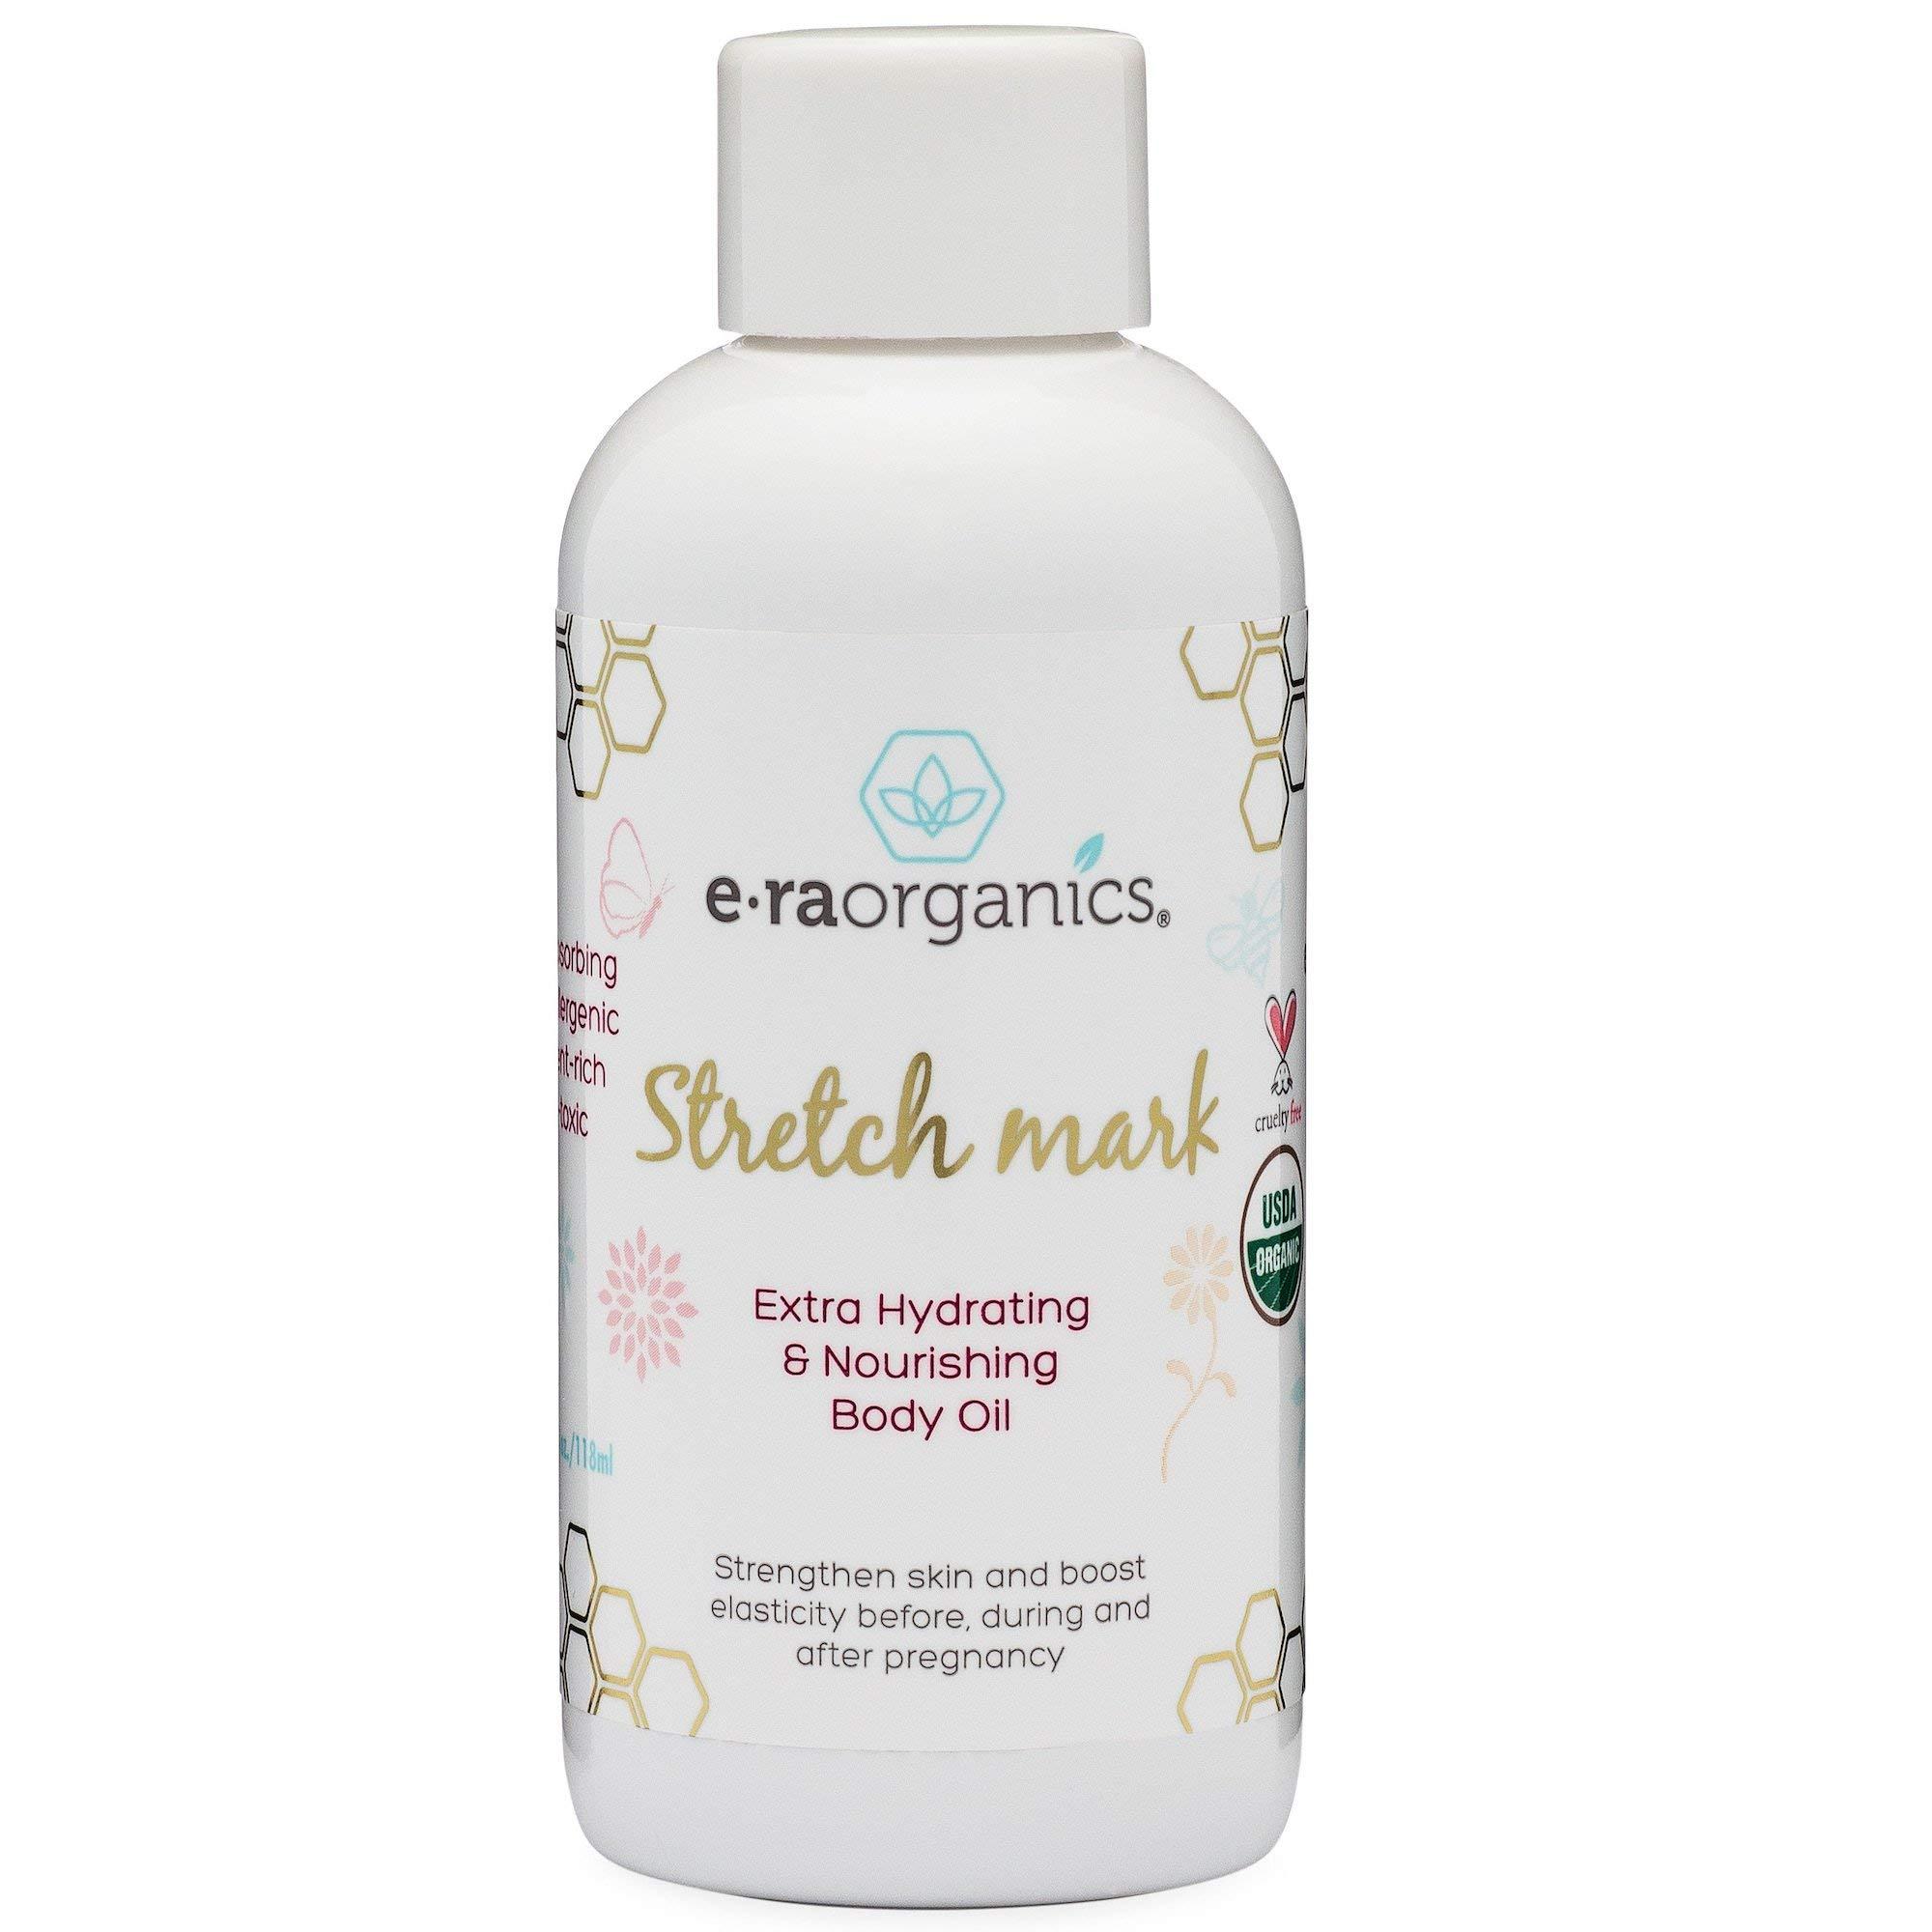 Organic Stretch Mark & Scar Treatment USDA Certified Organic Nourishing Body Oil to Reduce, Remove & Prevent Pregnancy Stretch Marks For New Moms. Perfect Moisturizer For Dry Skin 4oz Era-Organics by Era Organics